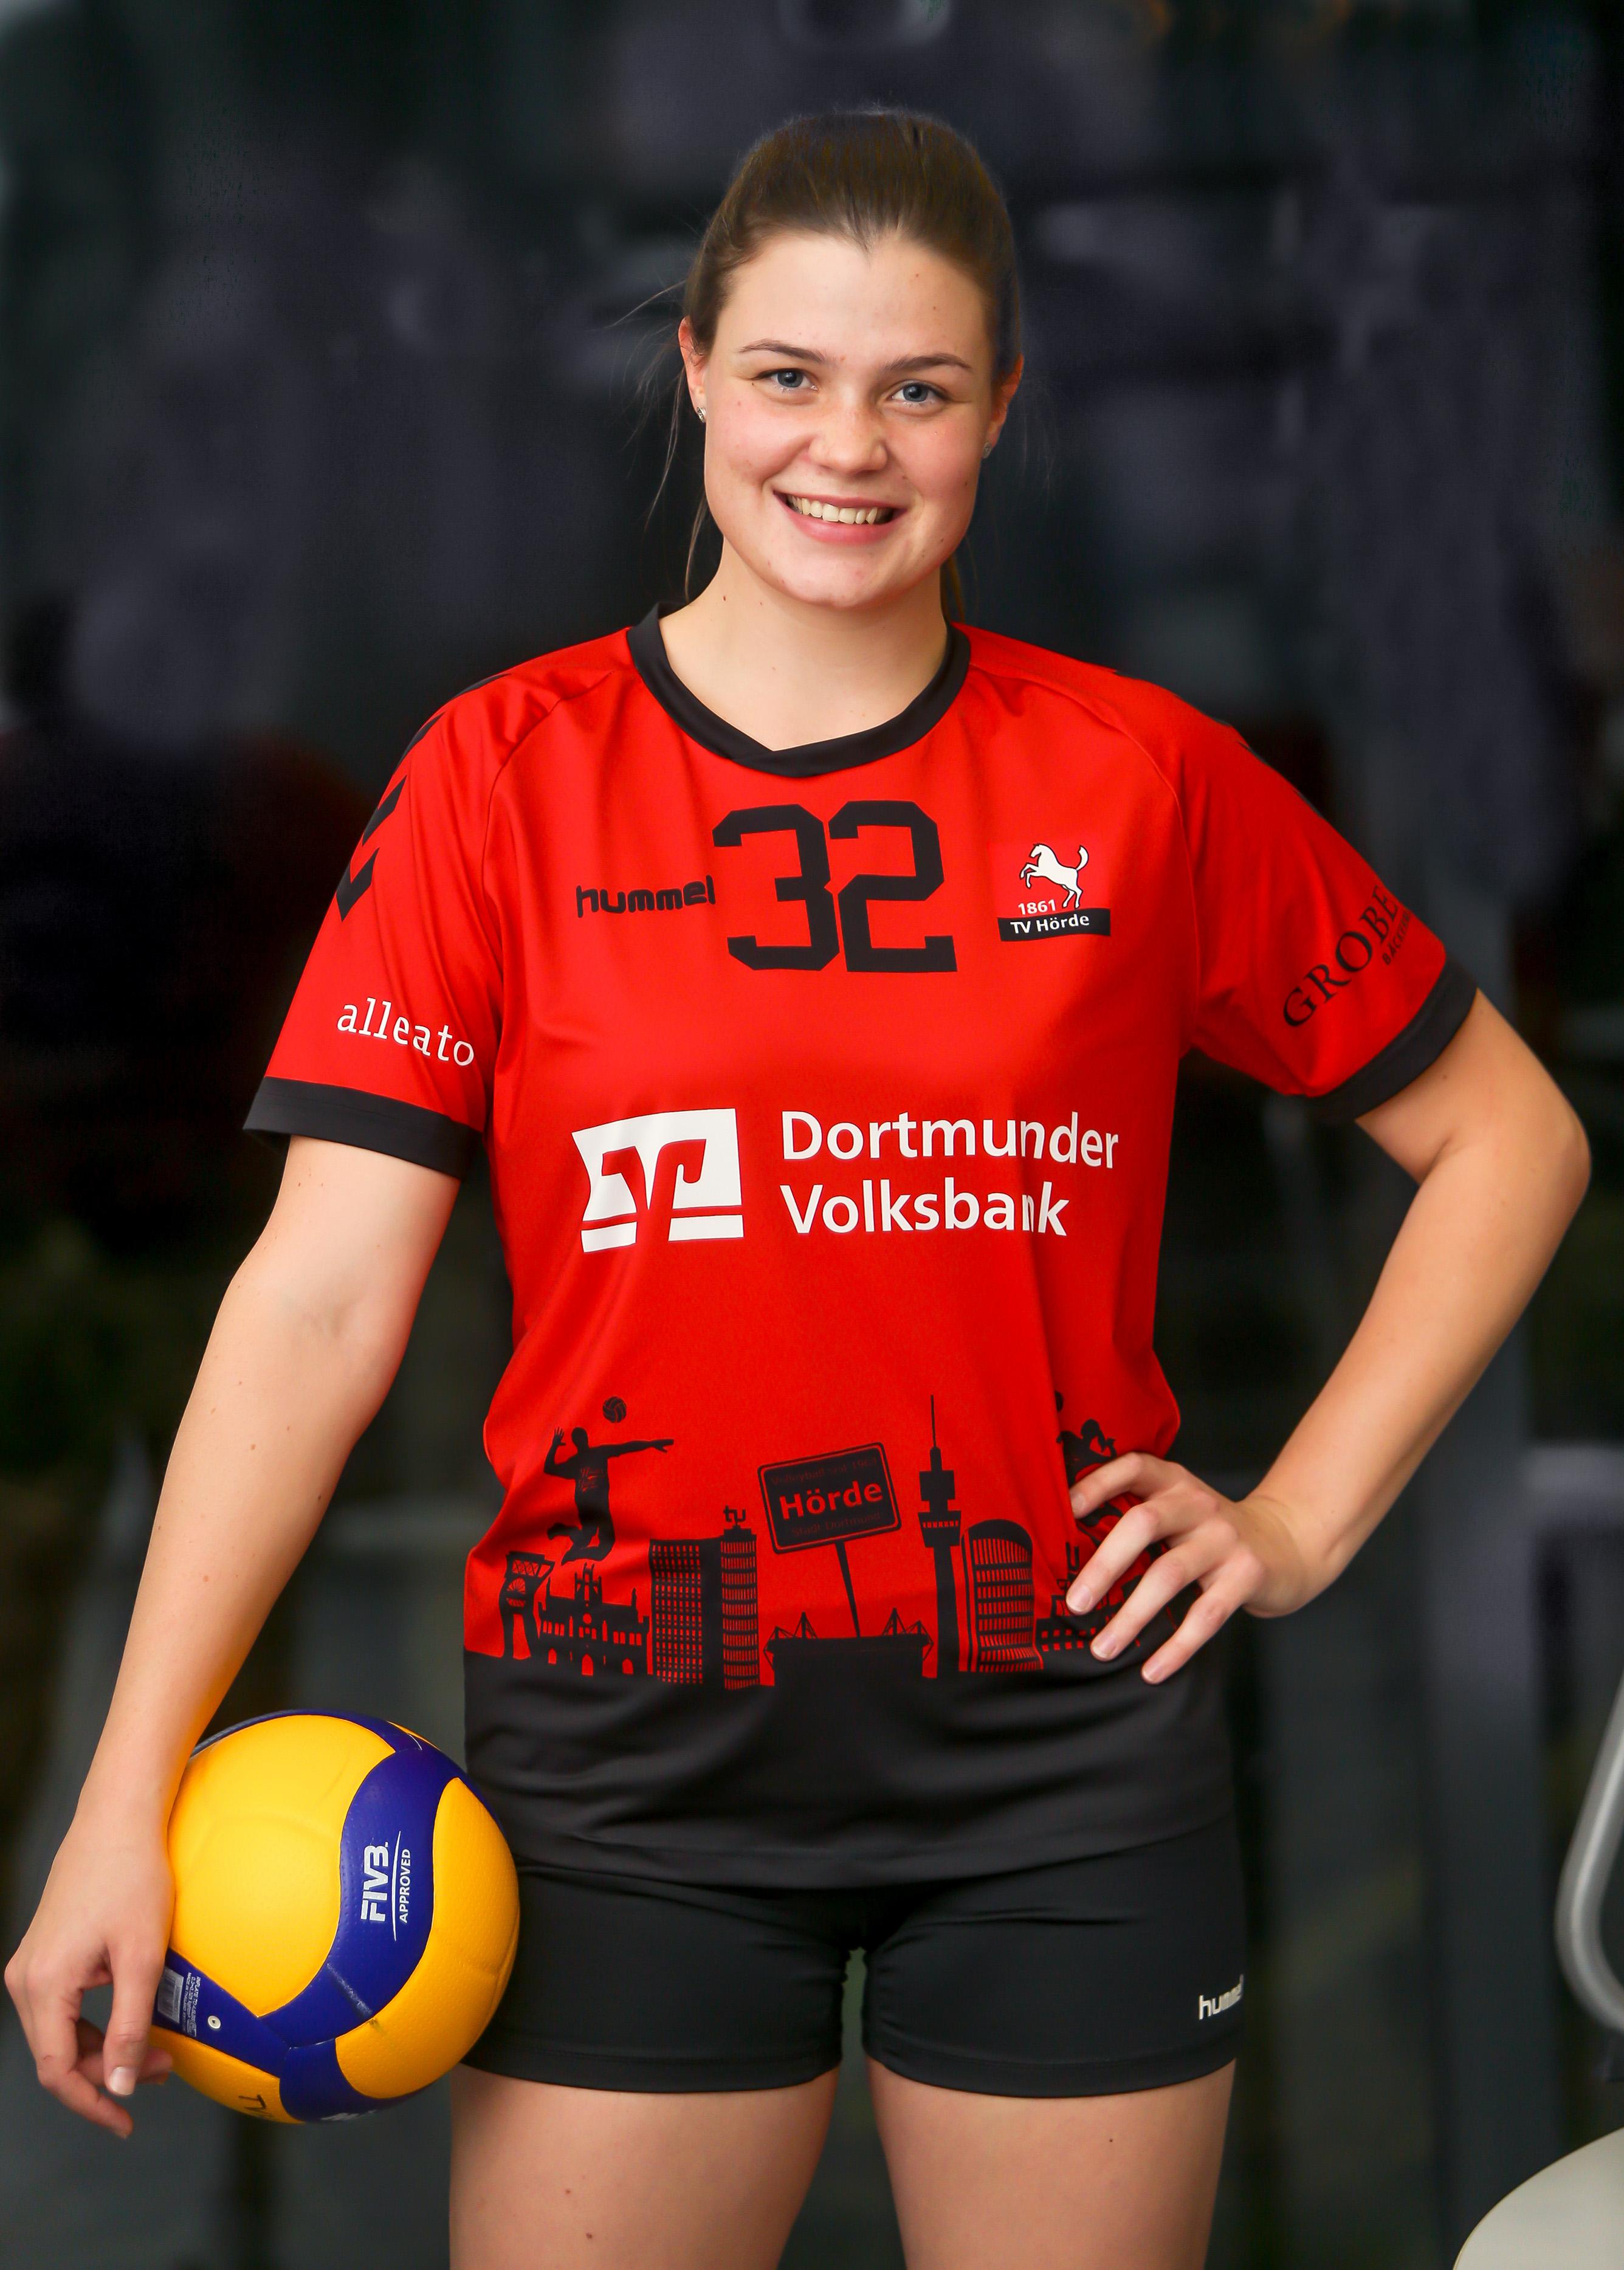 TV Hörde / Volleyball Foto: Dieter Menne Datum: 23.10.2019